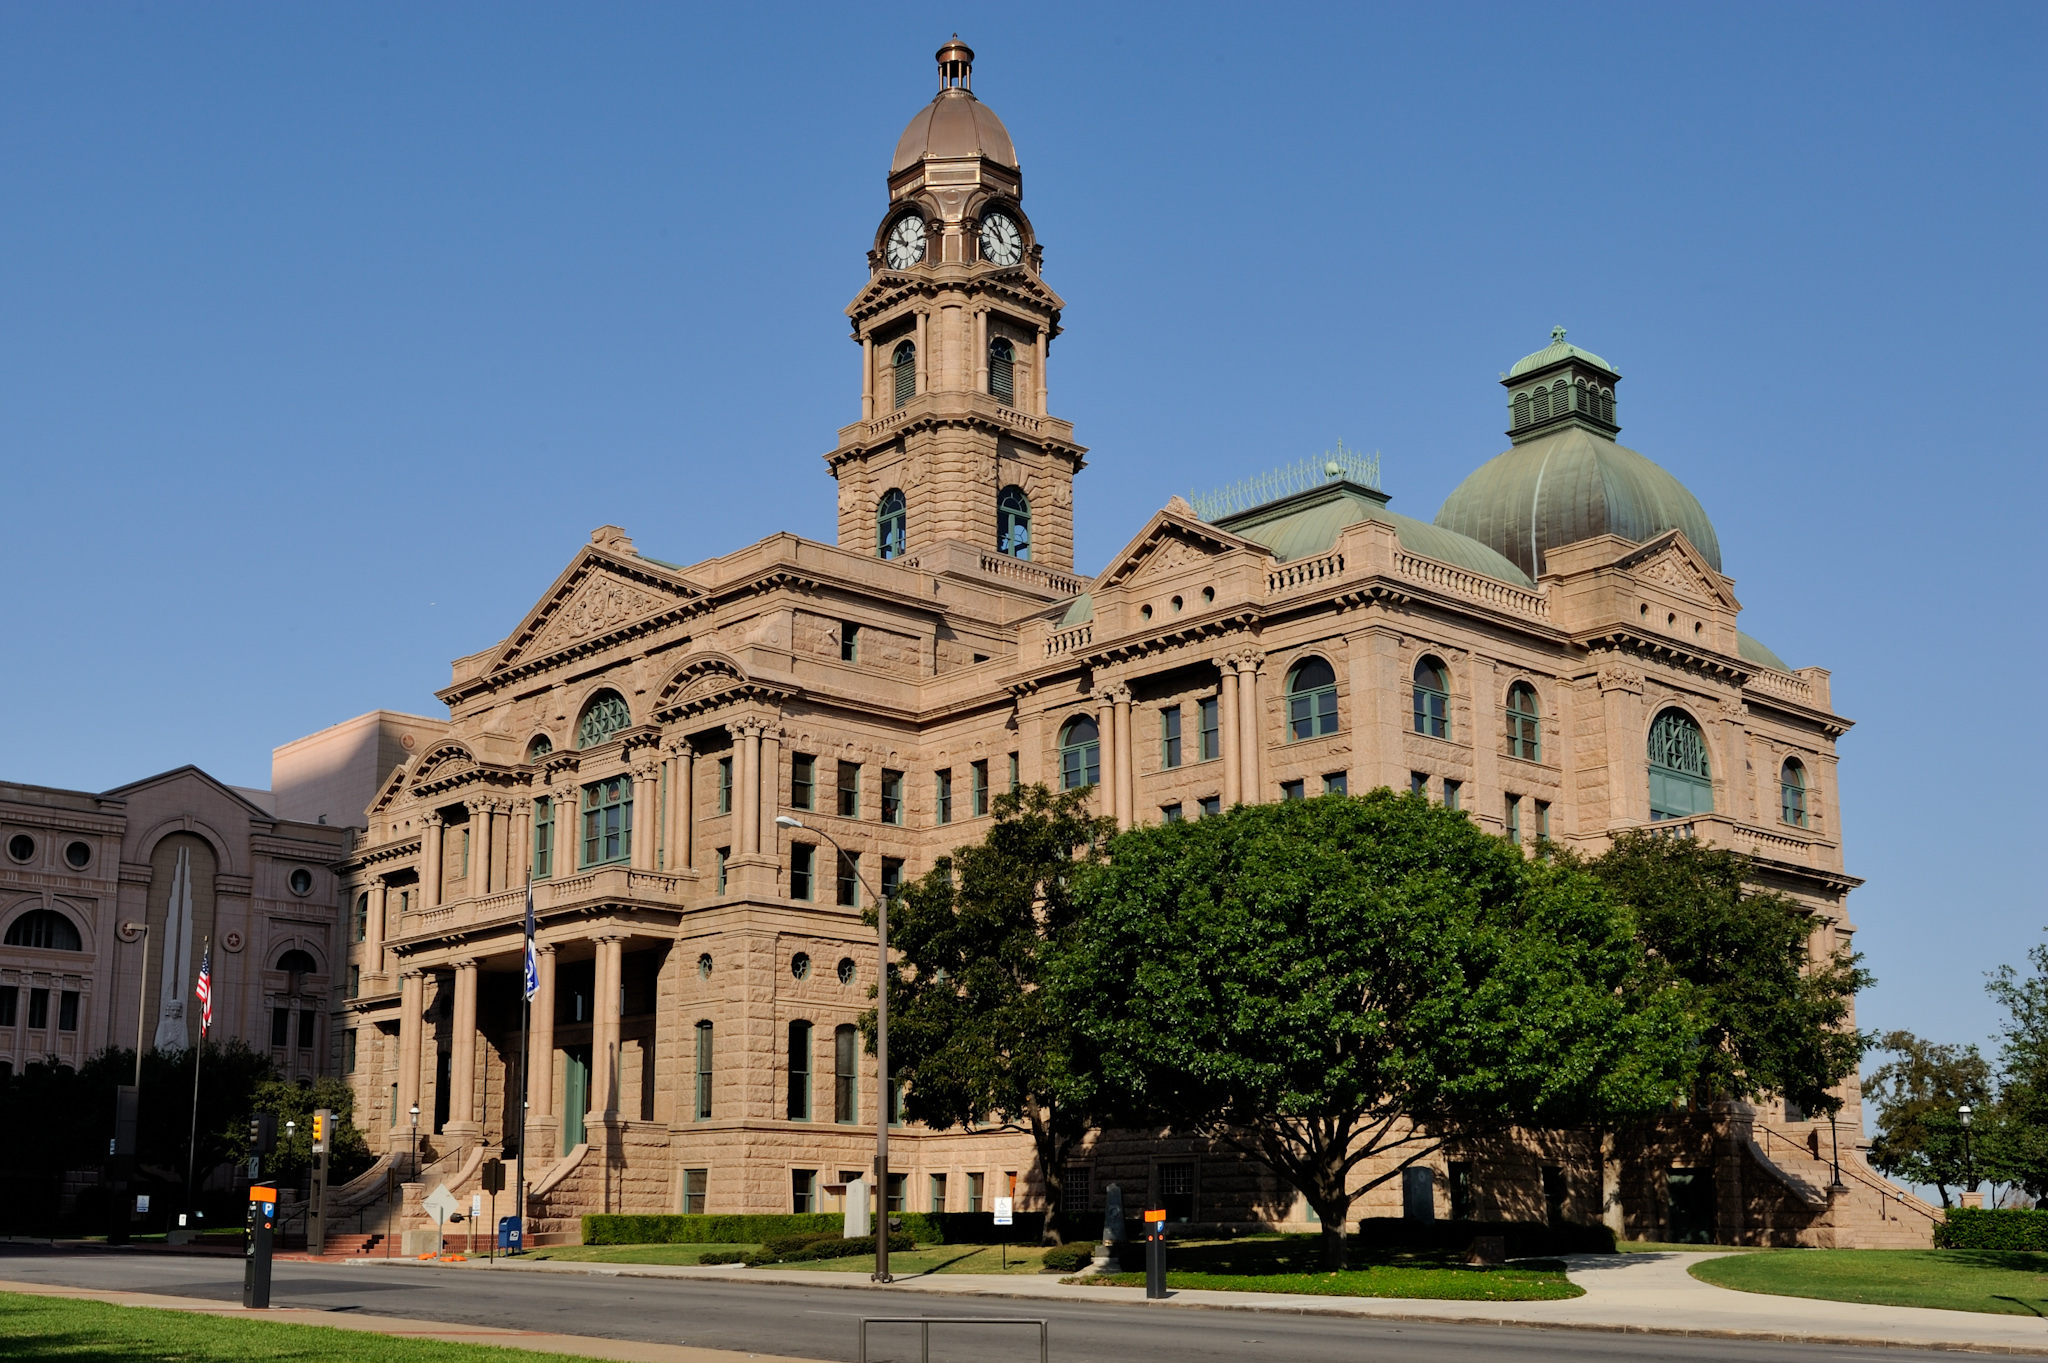 Tarrant_County_Courthouse_Full_E_Fort_Worth_Texas.jpg